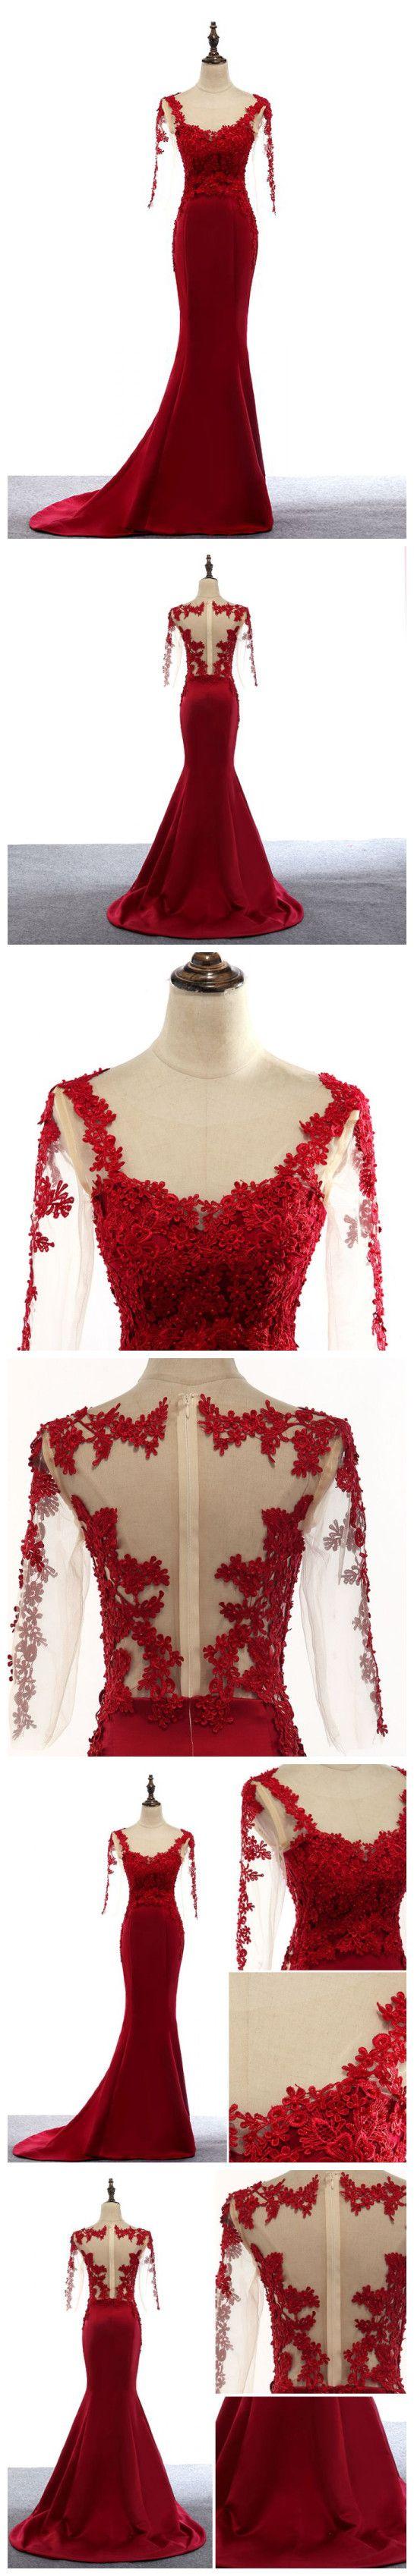 CHIC TRUMPET/MERMAID SCOOP RED SATIN APPLIQUE MODEST LONG PROM DRESS EVENING DRESS AM505